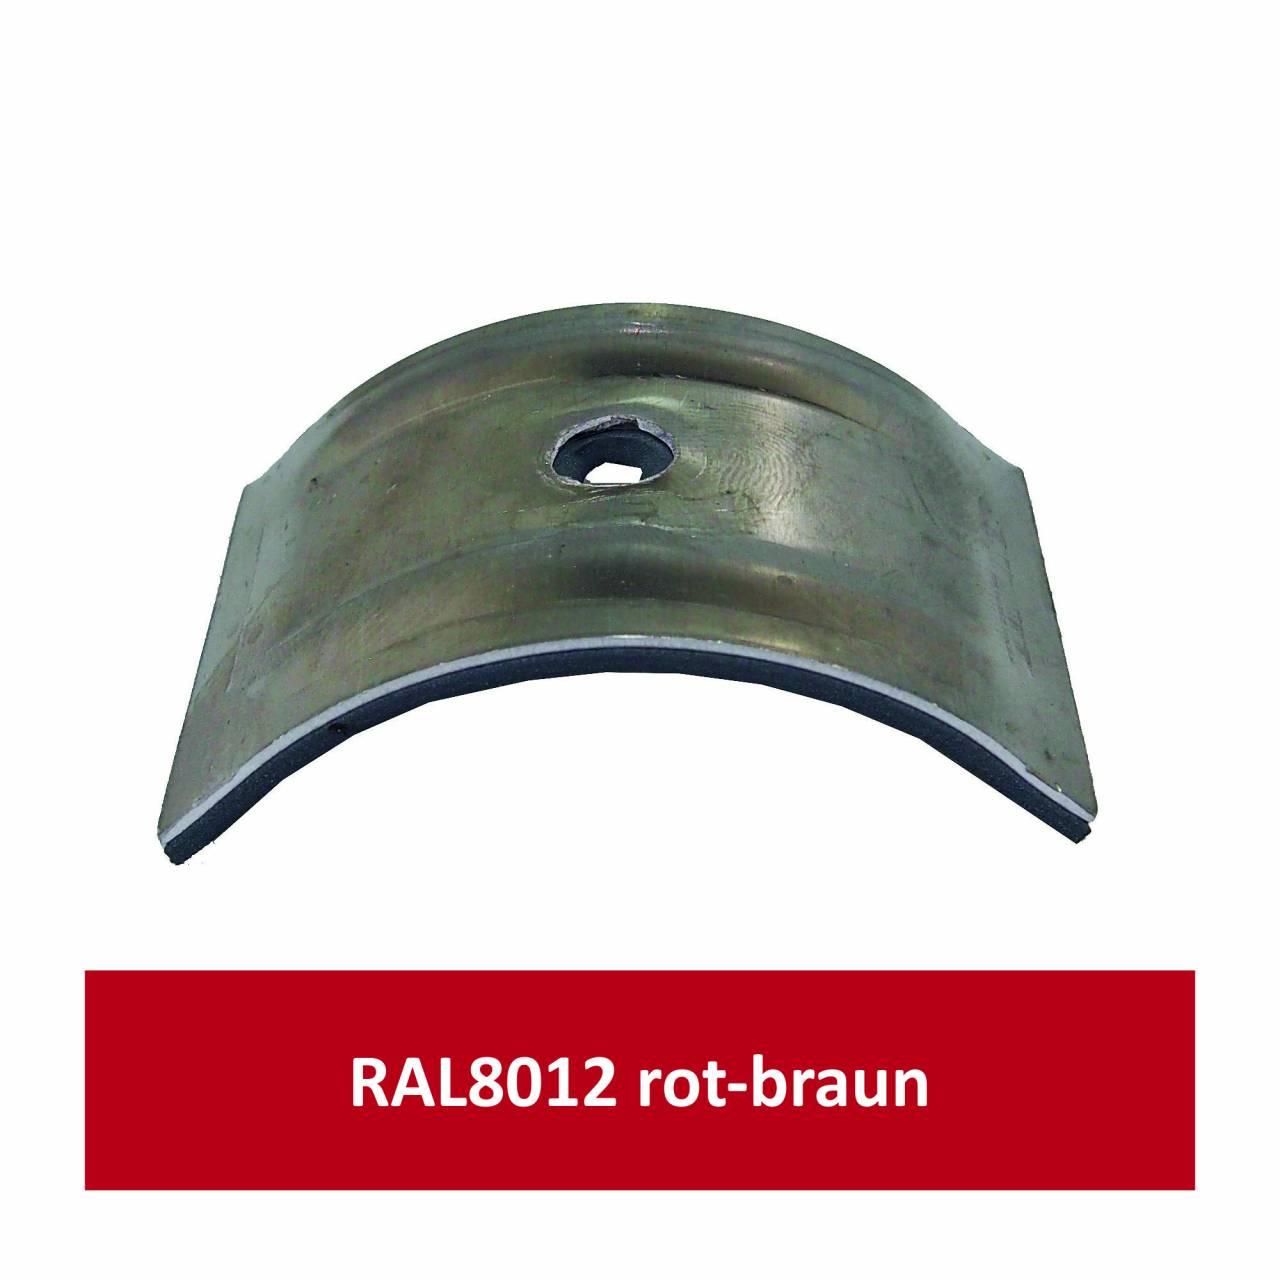 Kalotten für Welle 150/50, Alu RAL8012 rotbraun/ Pck a 100 Stück